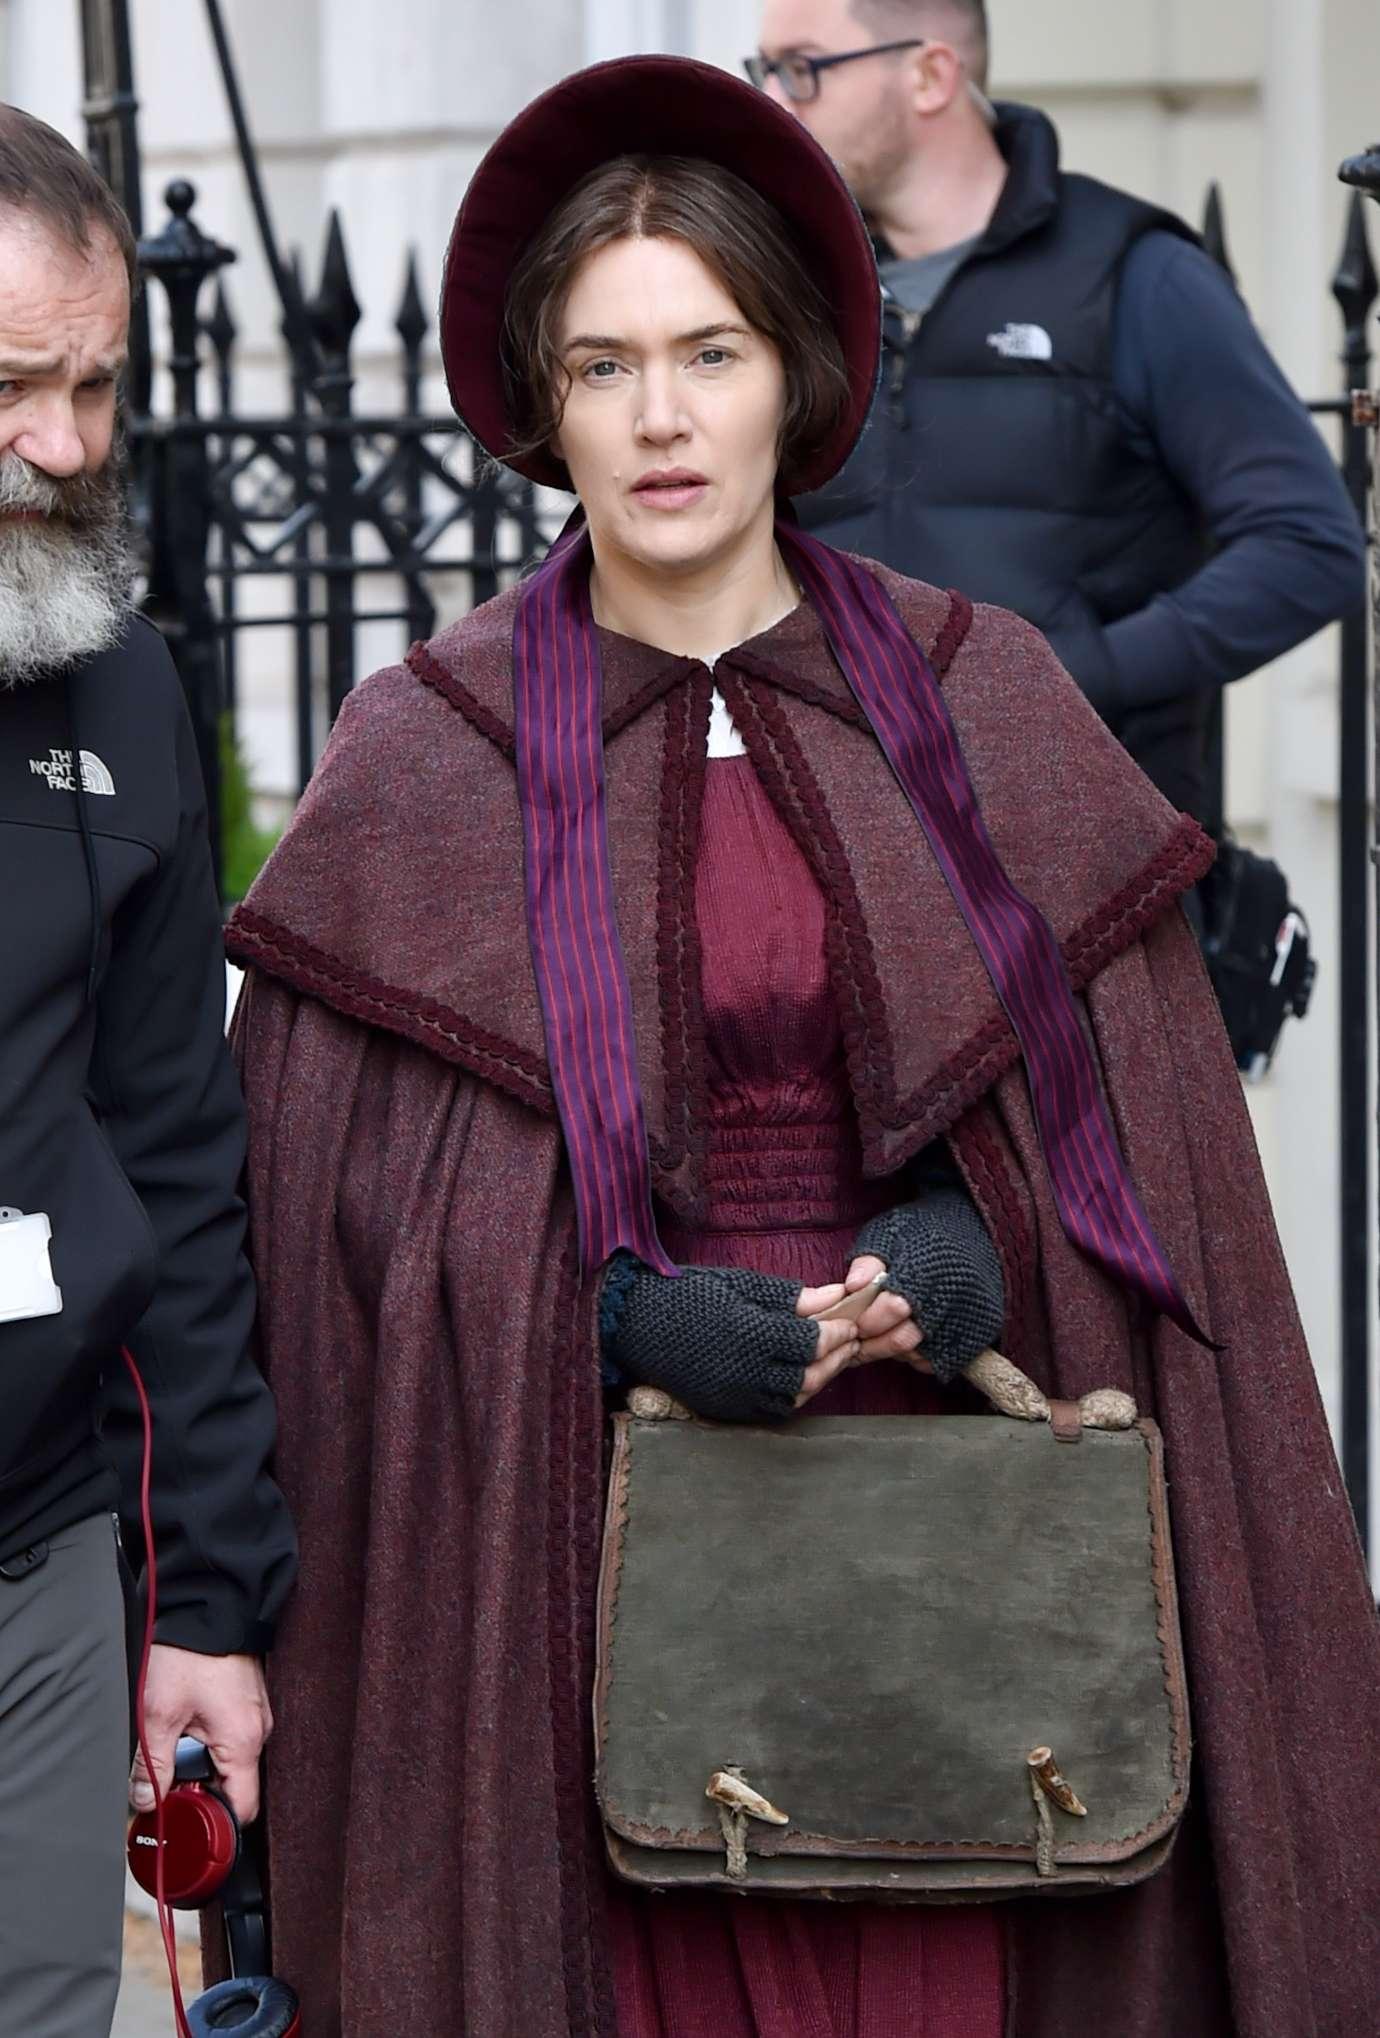 Kate Winslet - Ammonite movie set in London